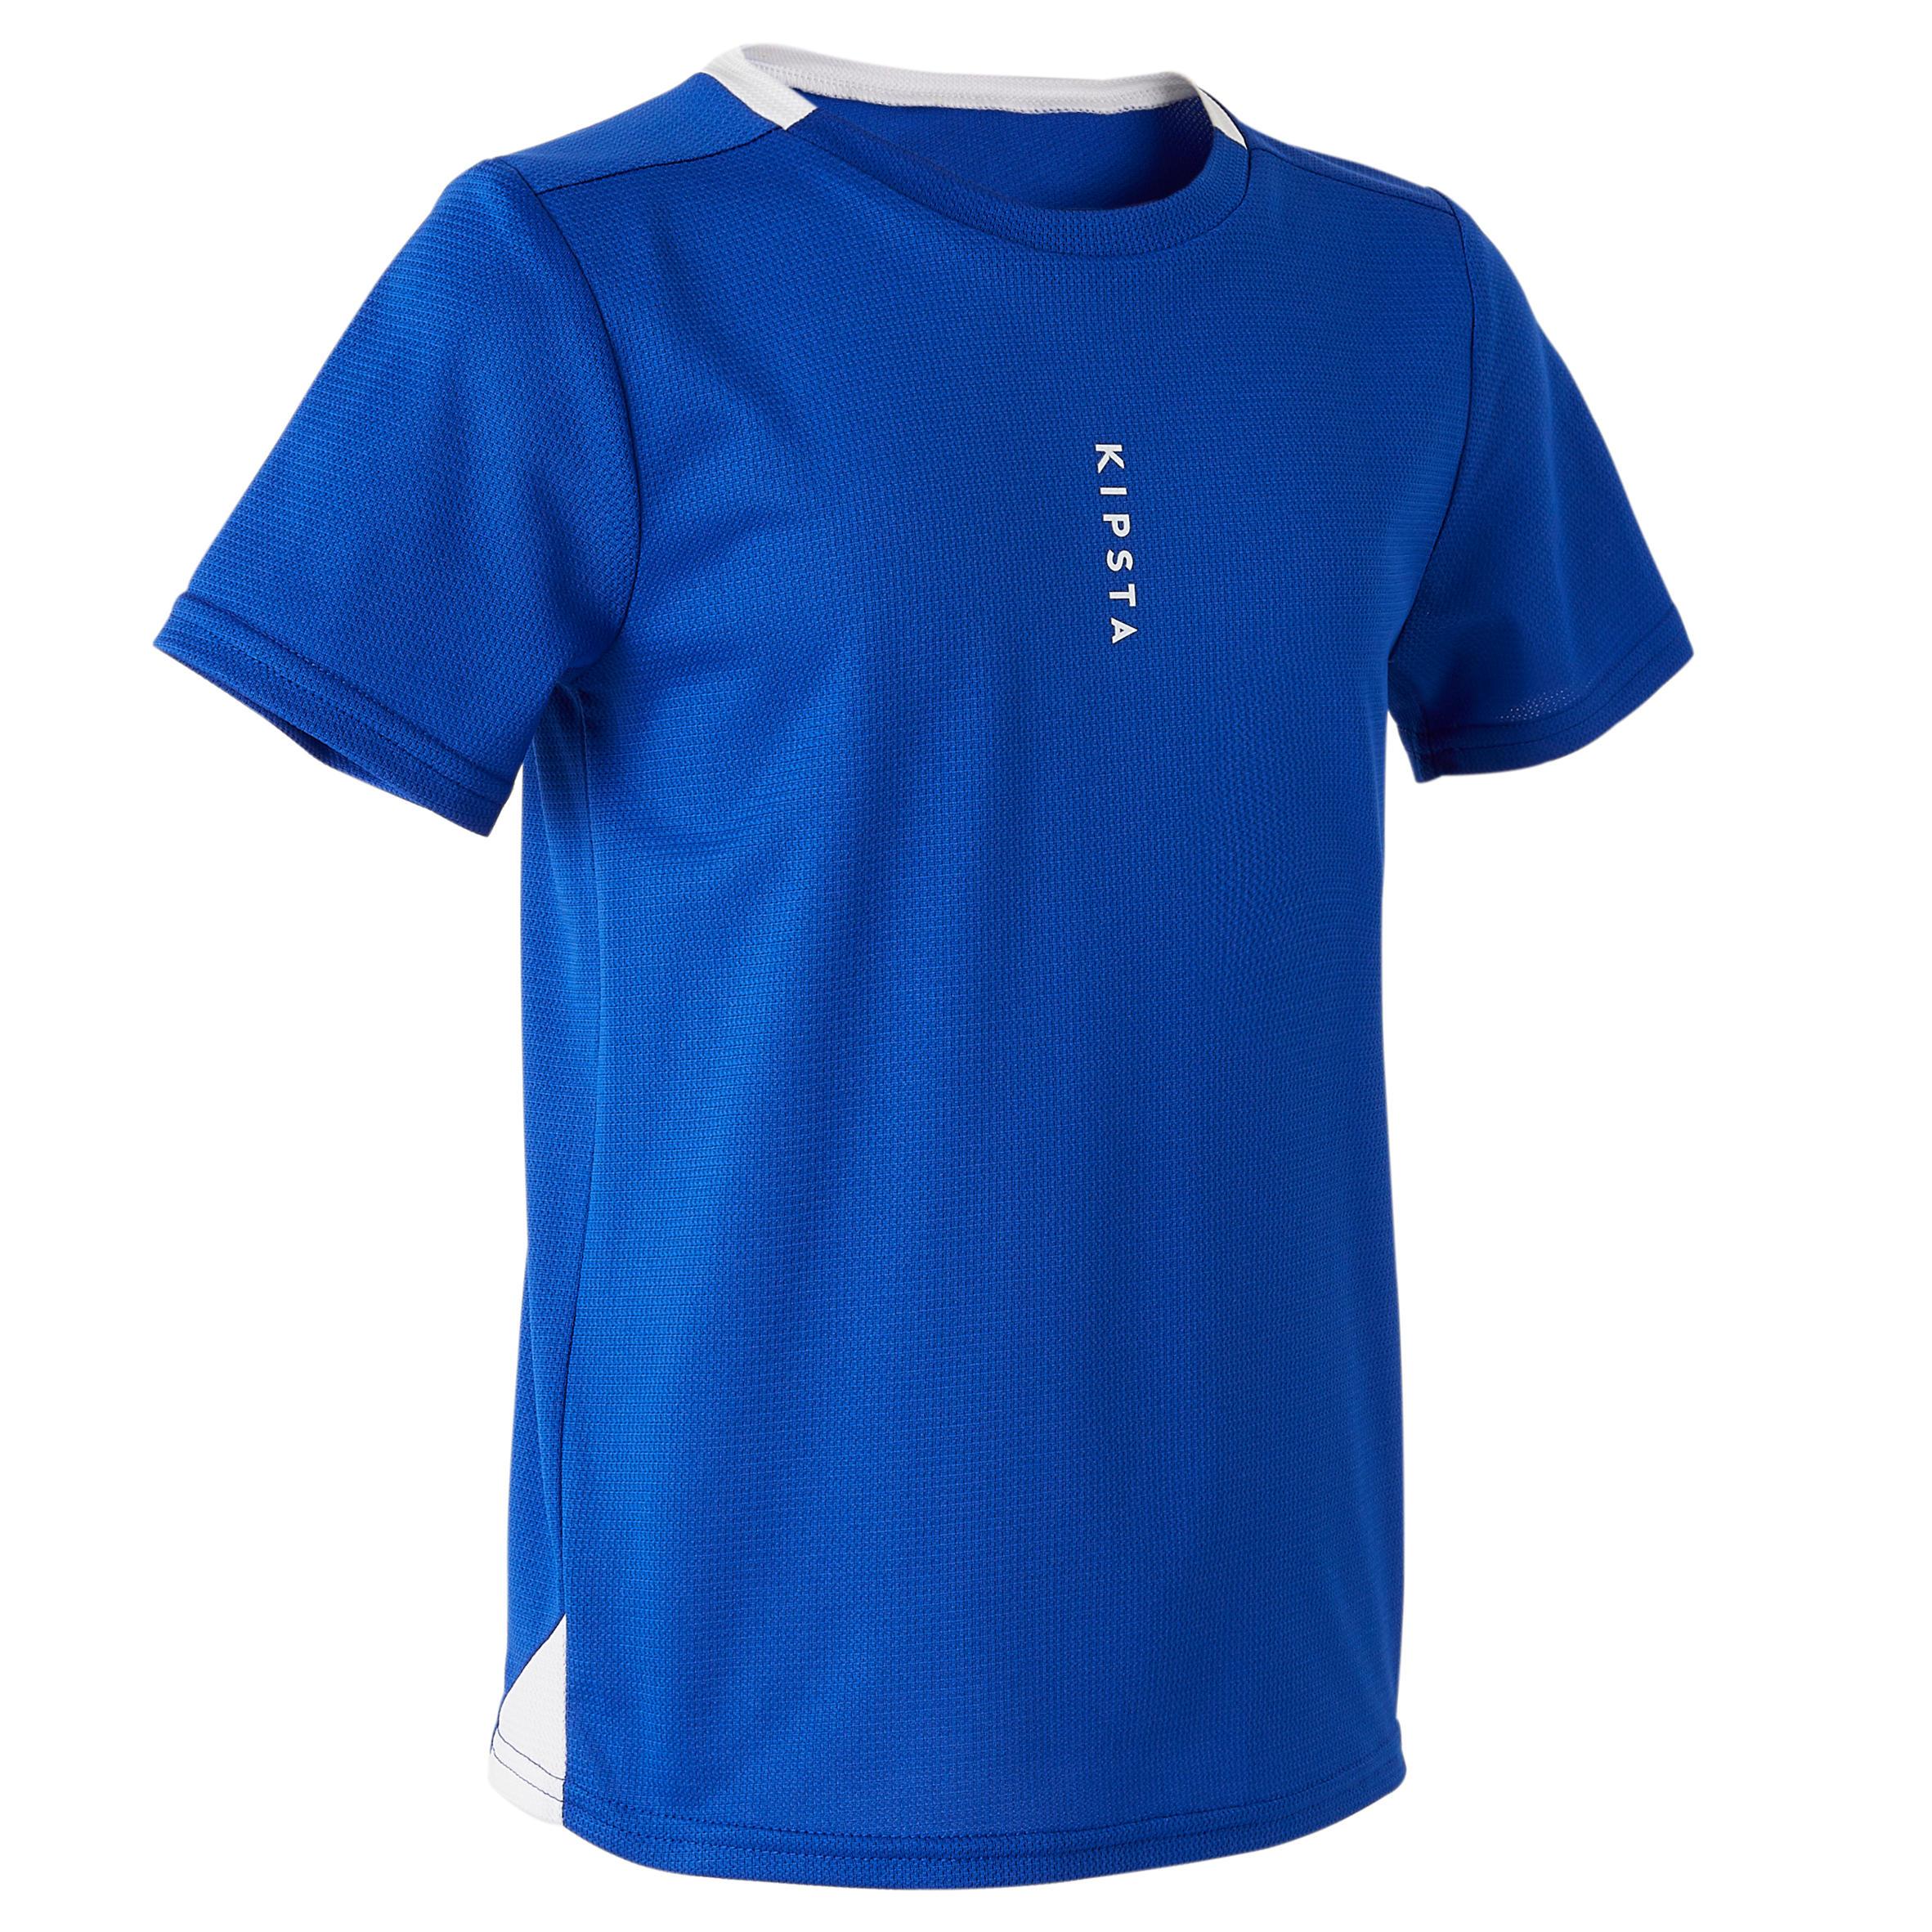 F100 Kids' Football Shirt - Indigo Blue